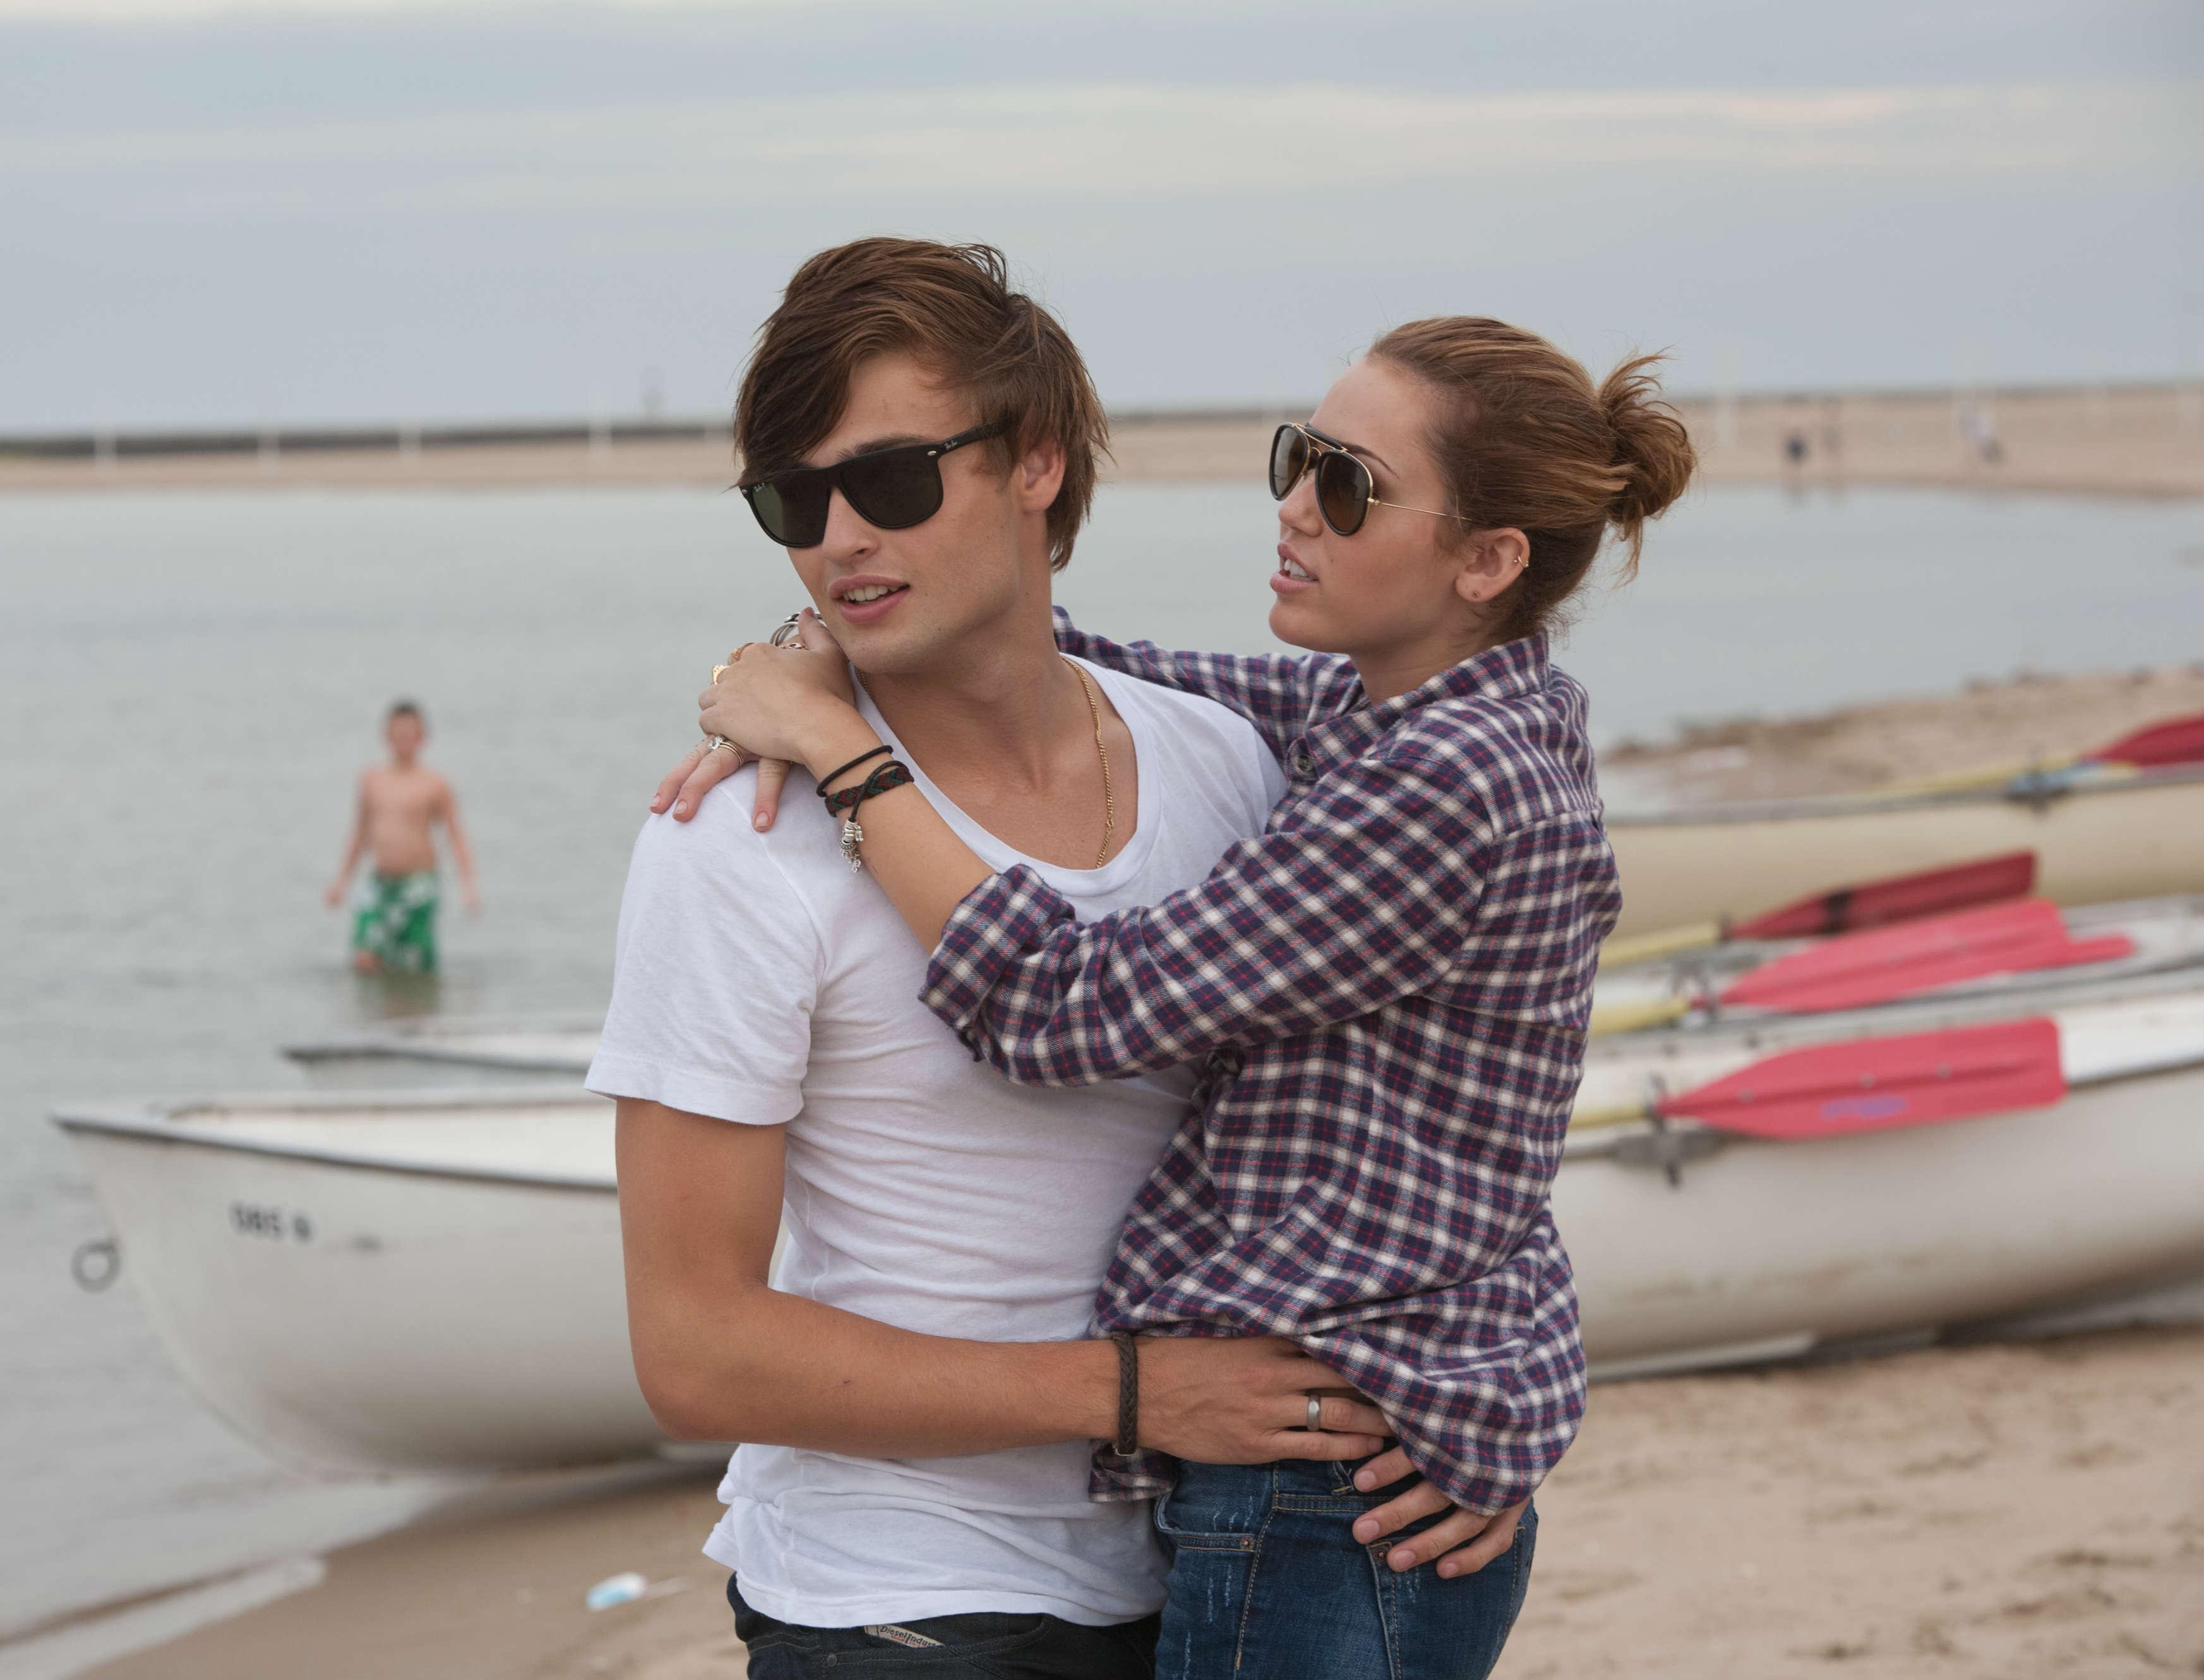 Åh, den dybtfølte kærlighed (Douglas Booth og Miley Cyrus). Photo courtesy of Scanbox Entertainment.